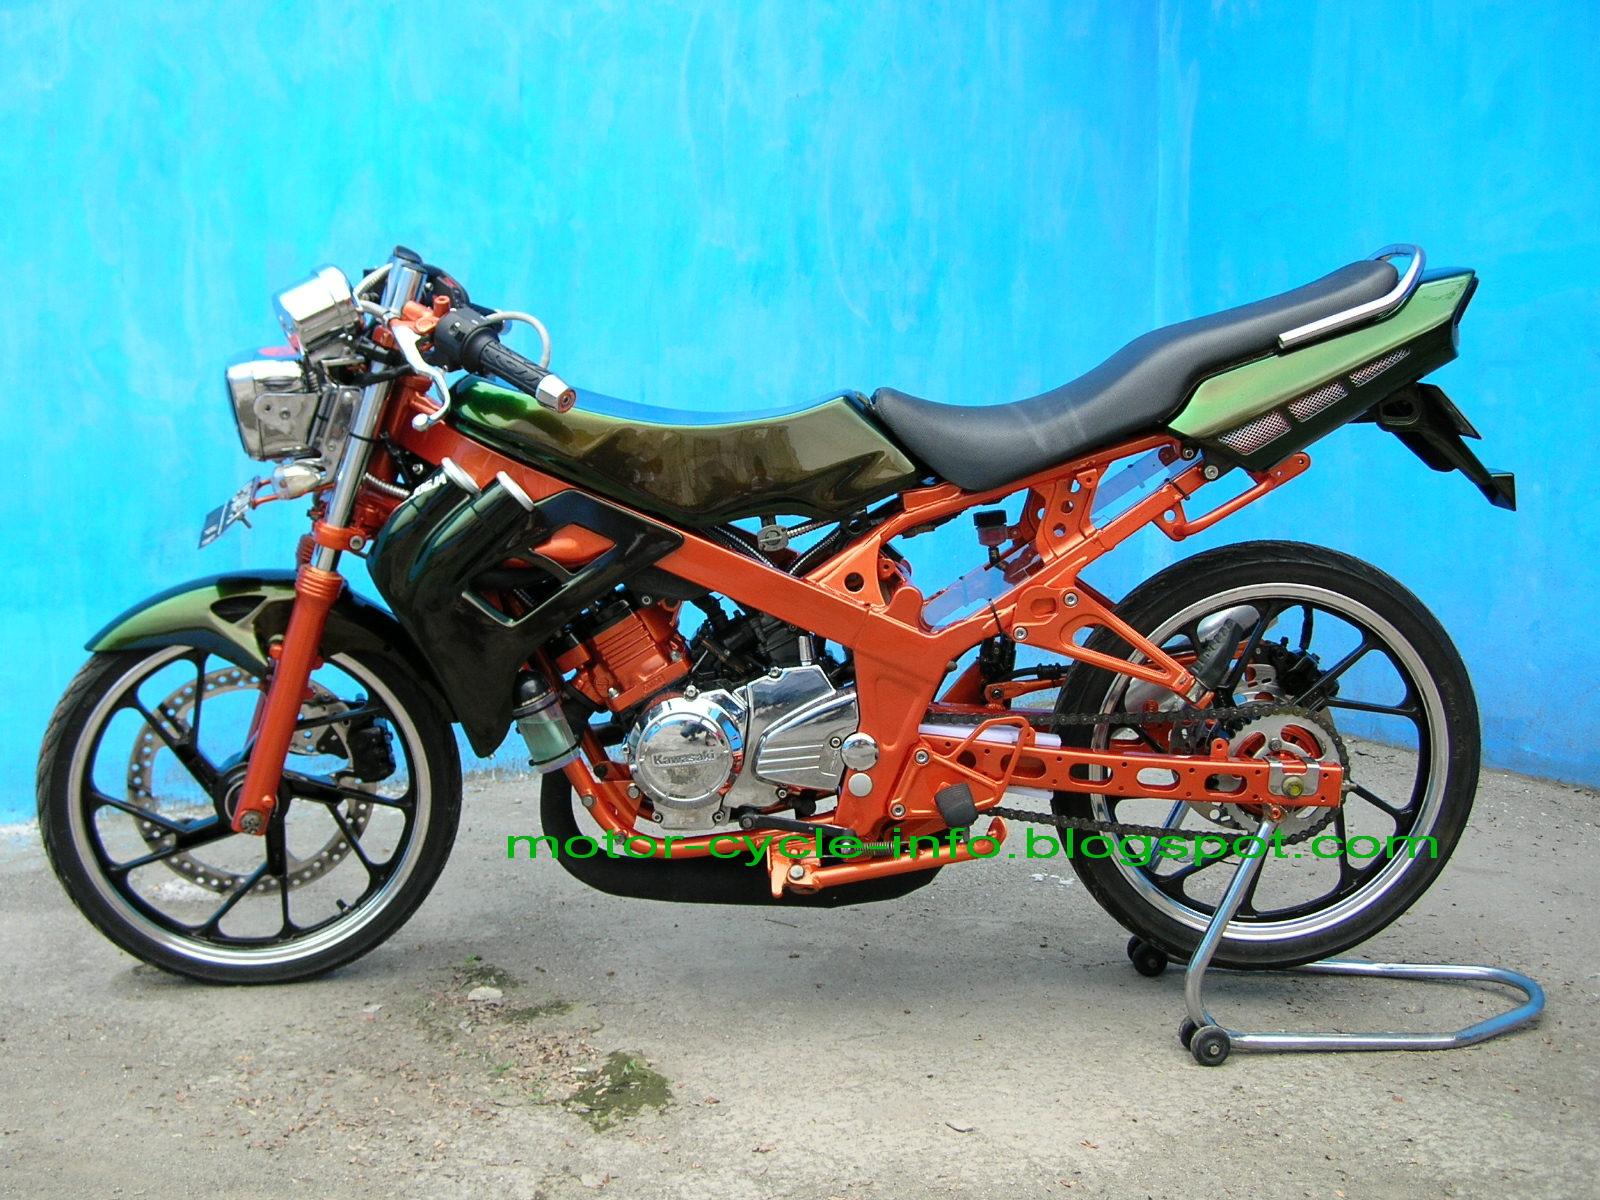 Gambar Kawasaki Ninja Modif Extreme Jogja